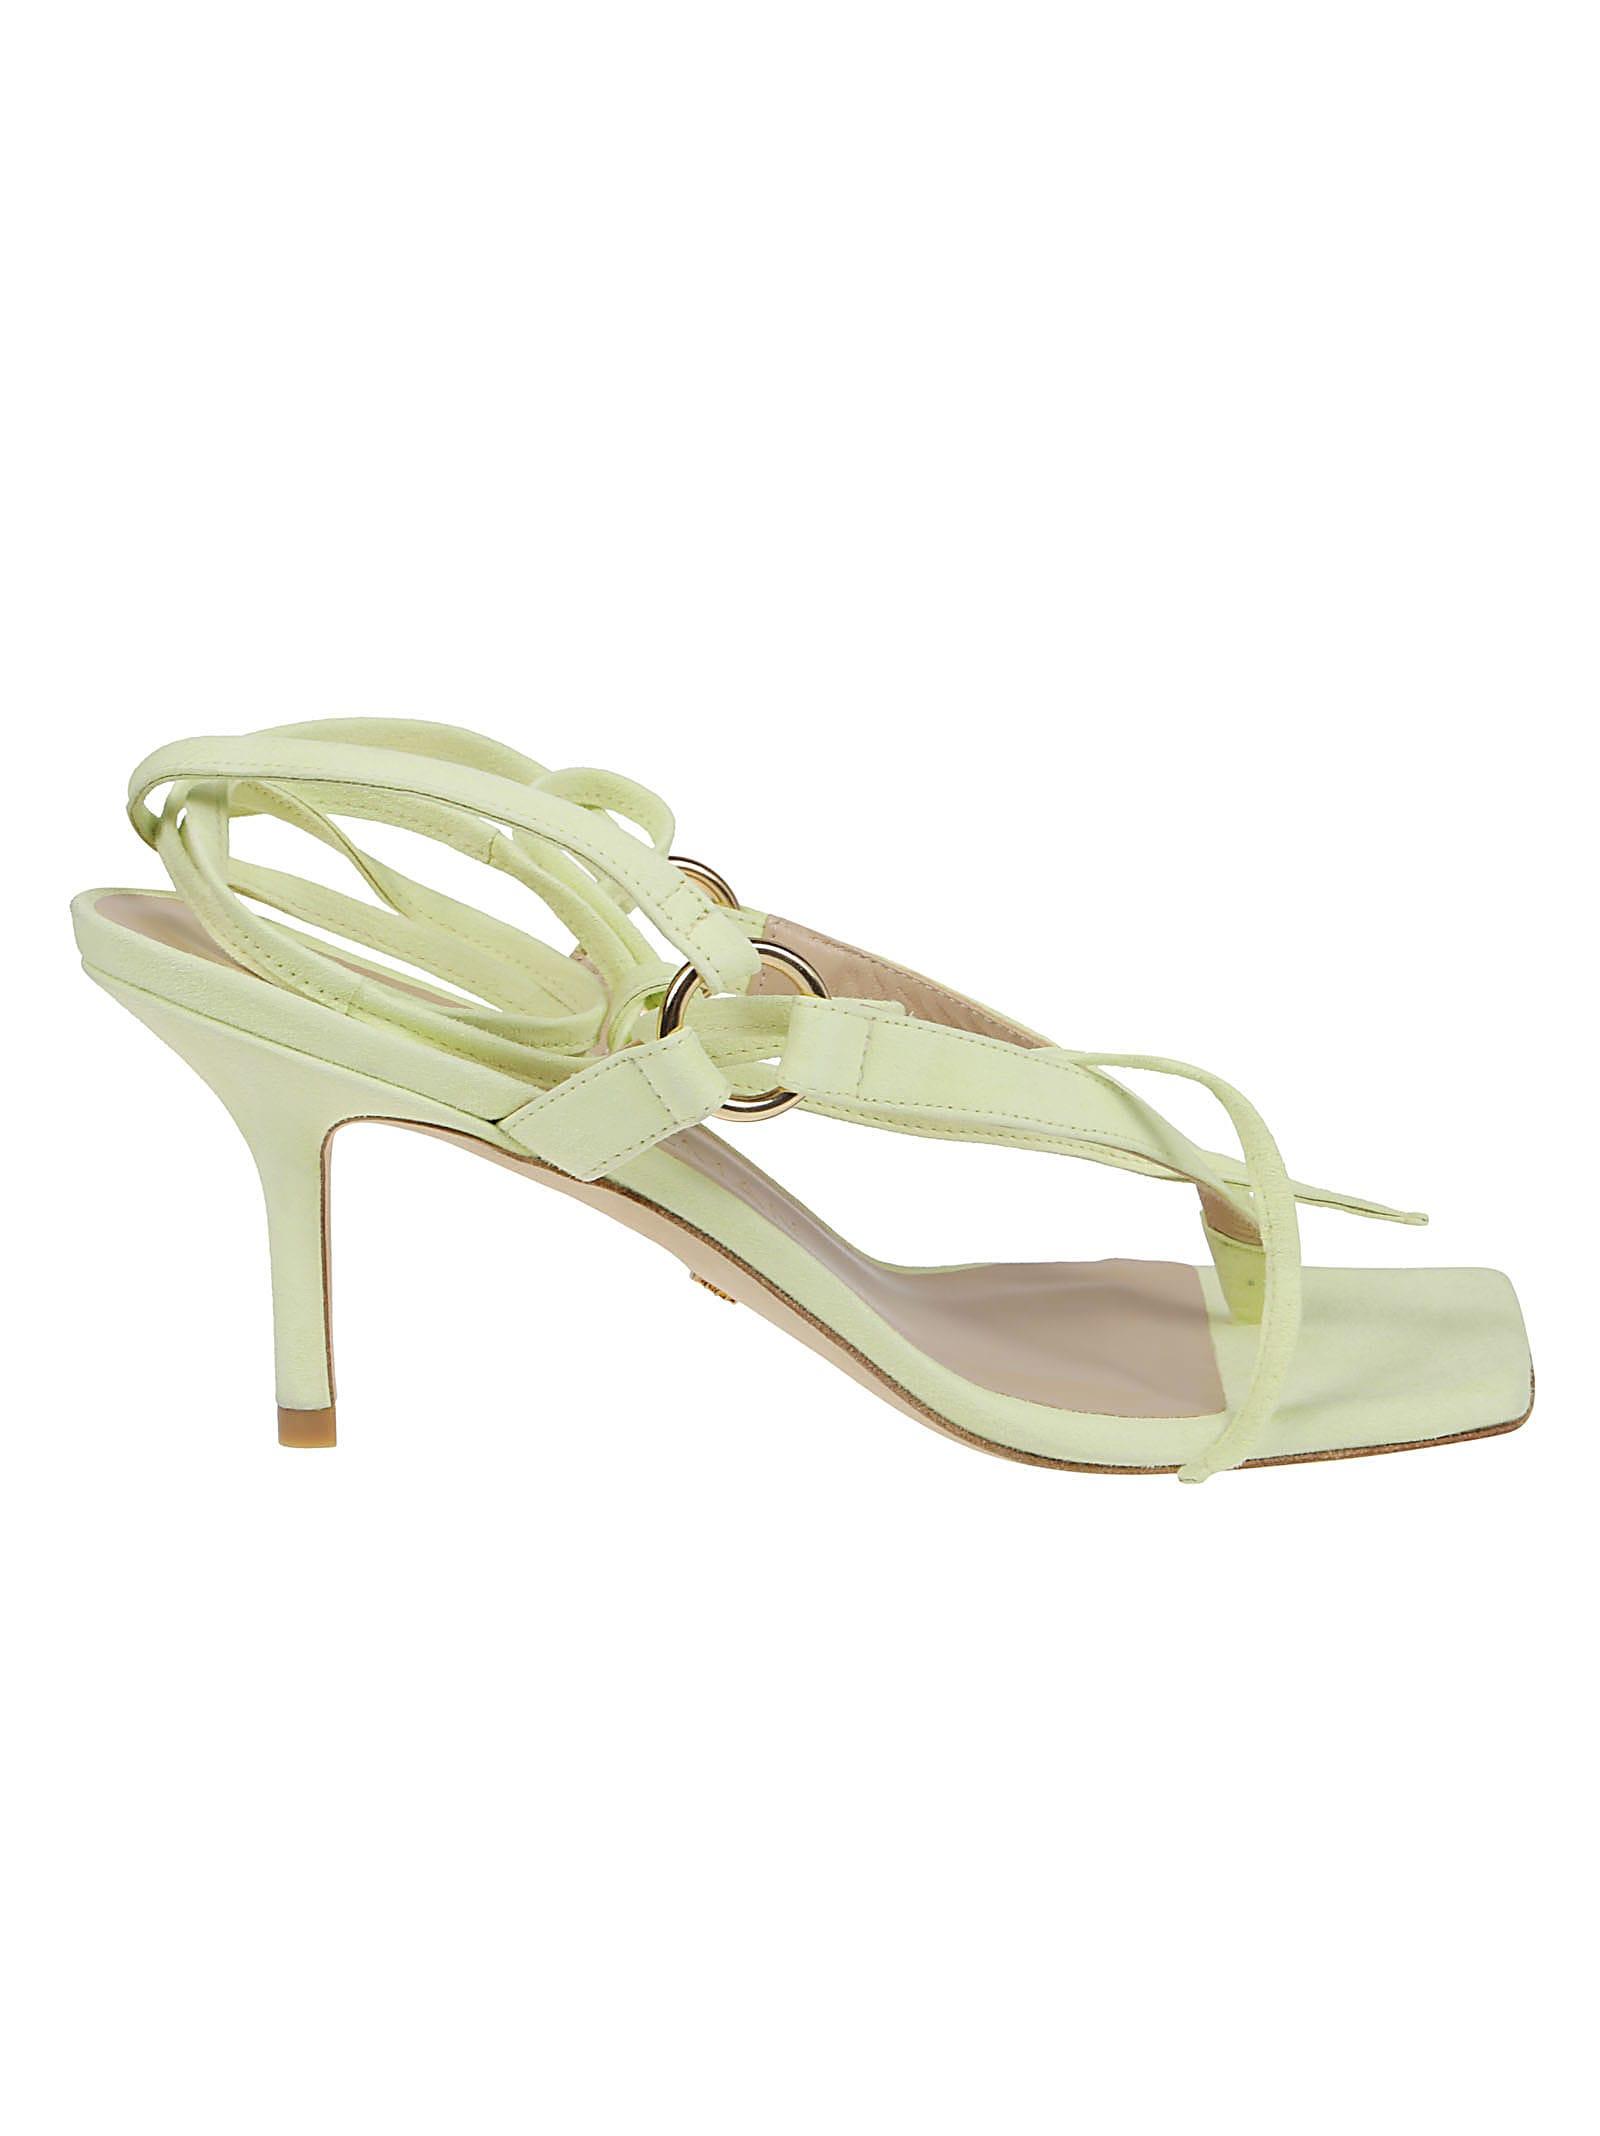 Buy Stuart Weitzman Lalita 75 Sandals online, shop Stuart Weitzman shoes with free shipping